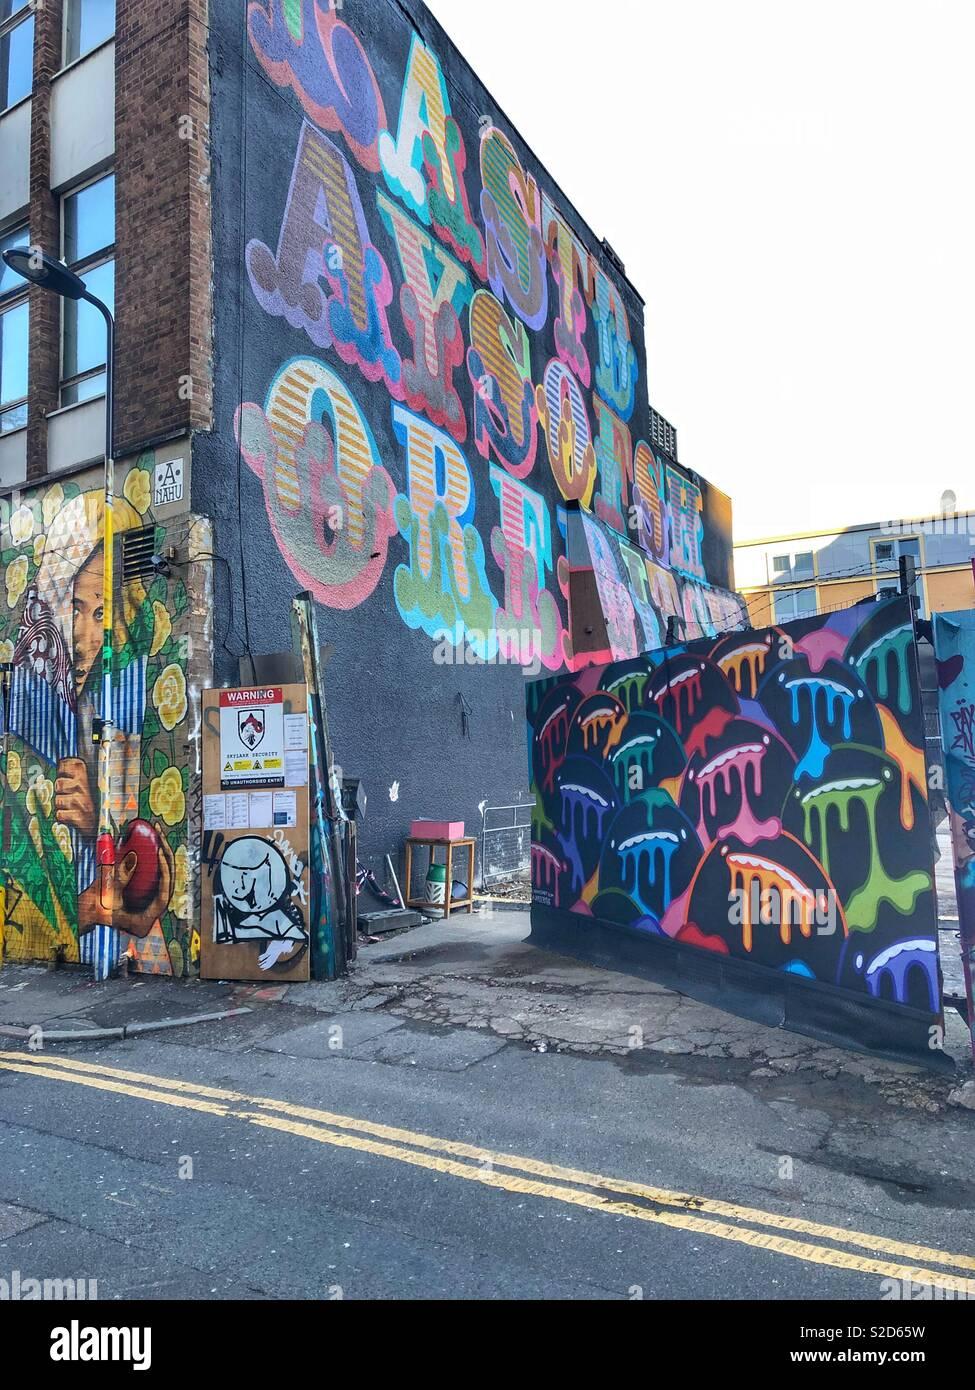 Shoreditch street art graffiti on rivington street, London - Stock Image